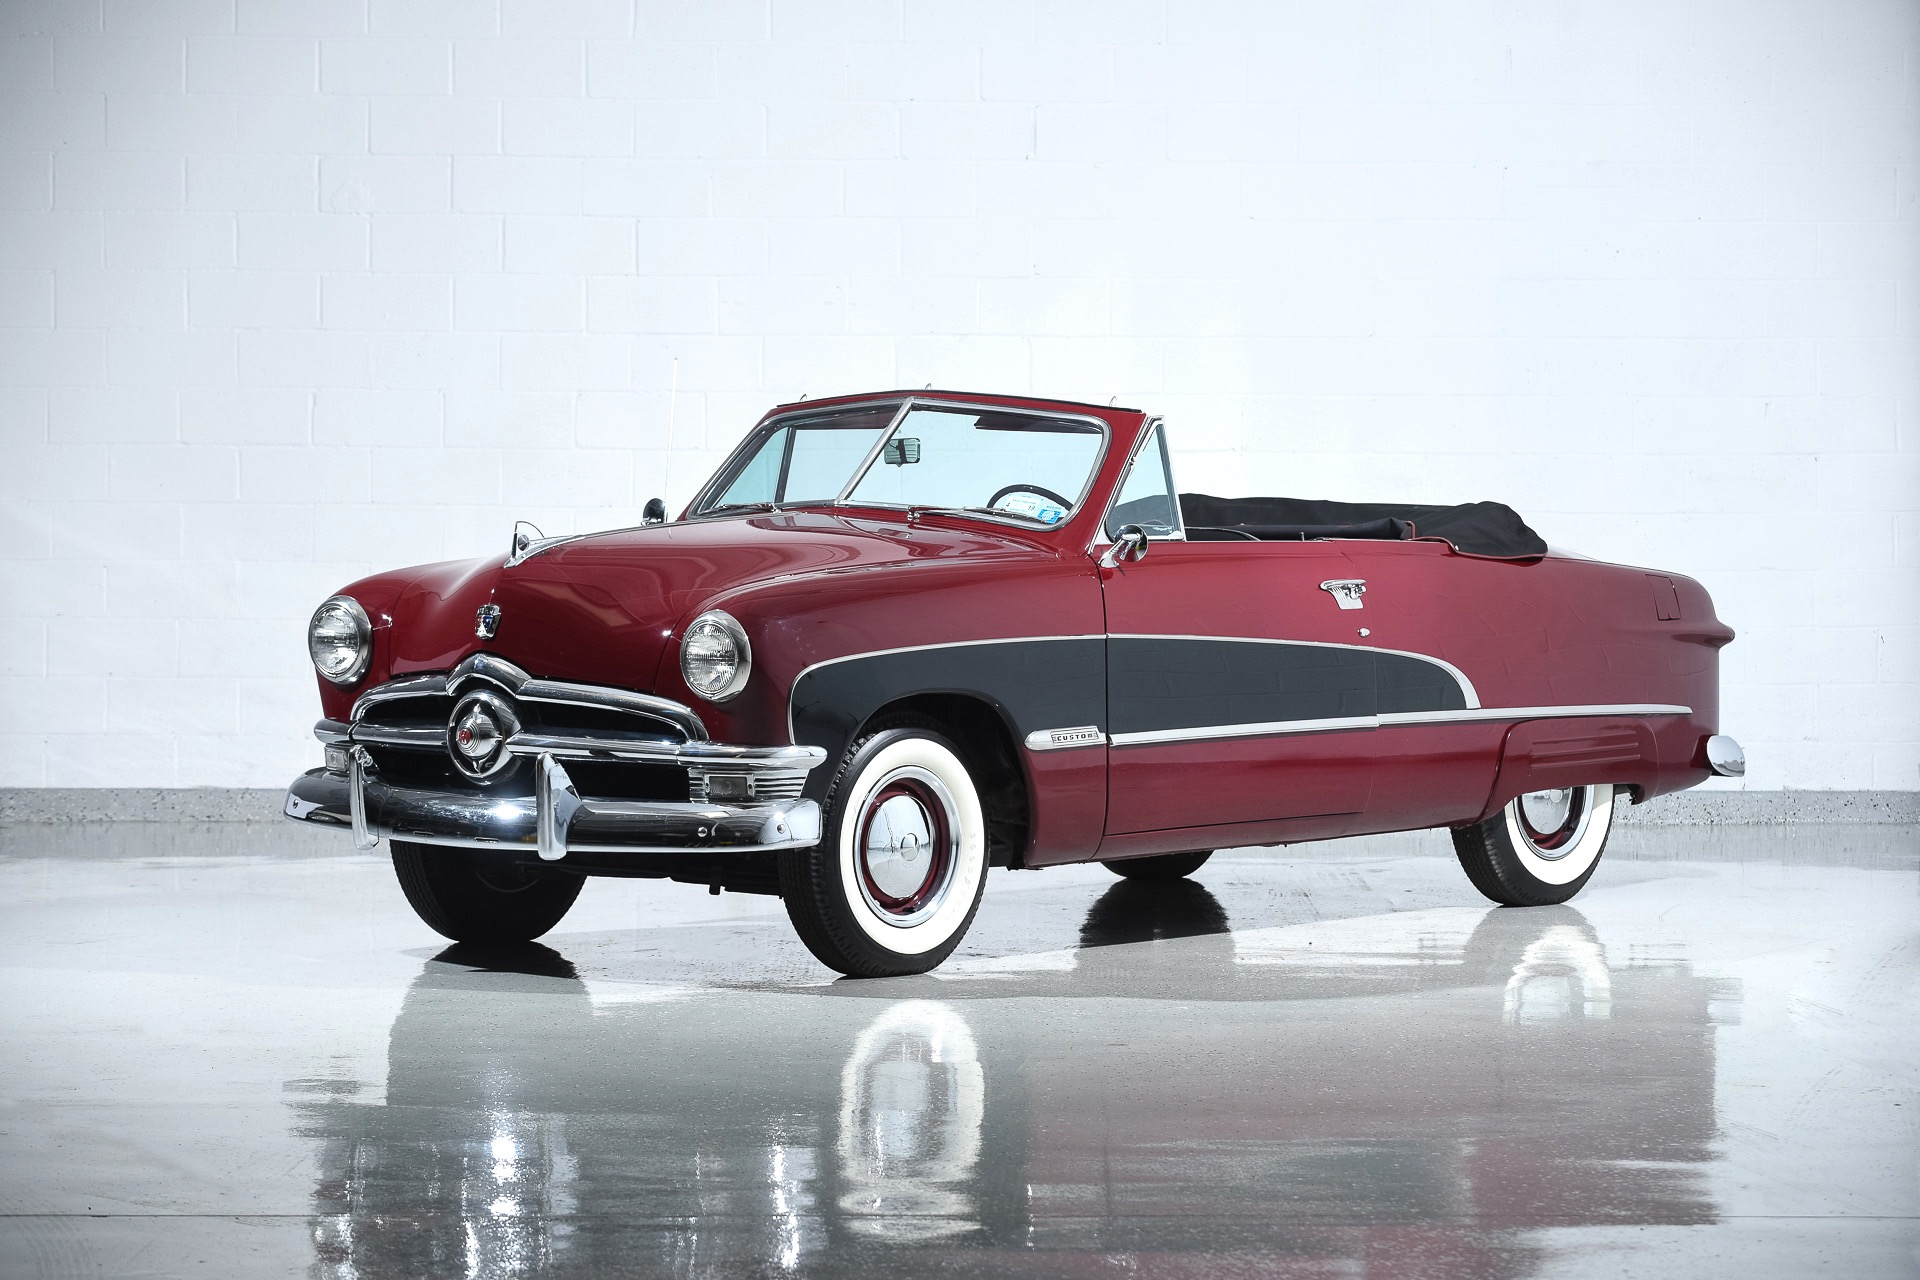 Used 1950 Ford Crestliner Custom Deluxe For Sale 44 900 Motorcar Classics Stock 1073